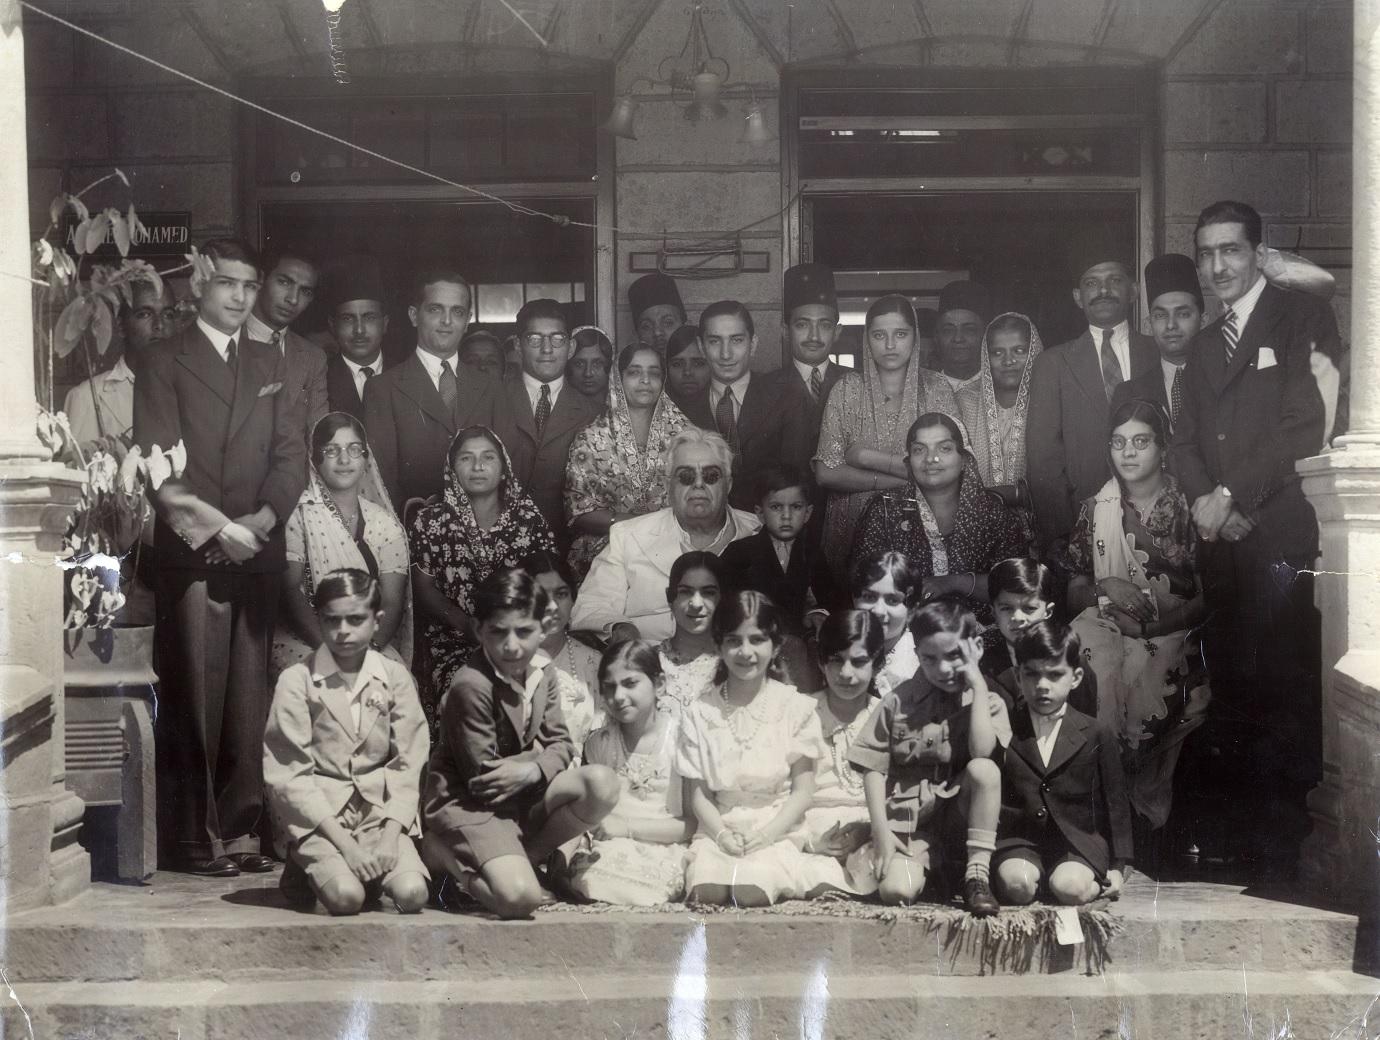 Jan Karmali Photo Collection; His Highness the Aga Khan Barakah